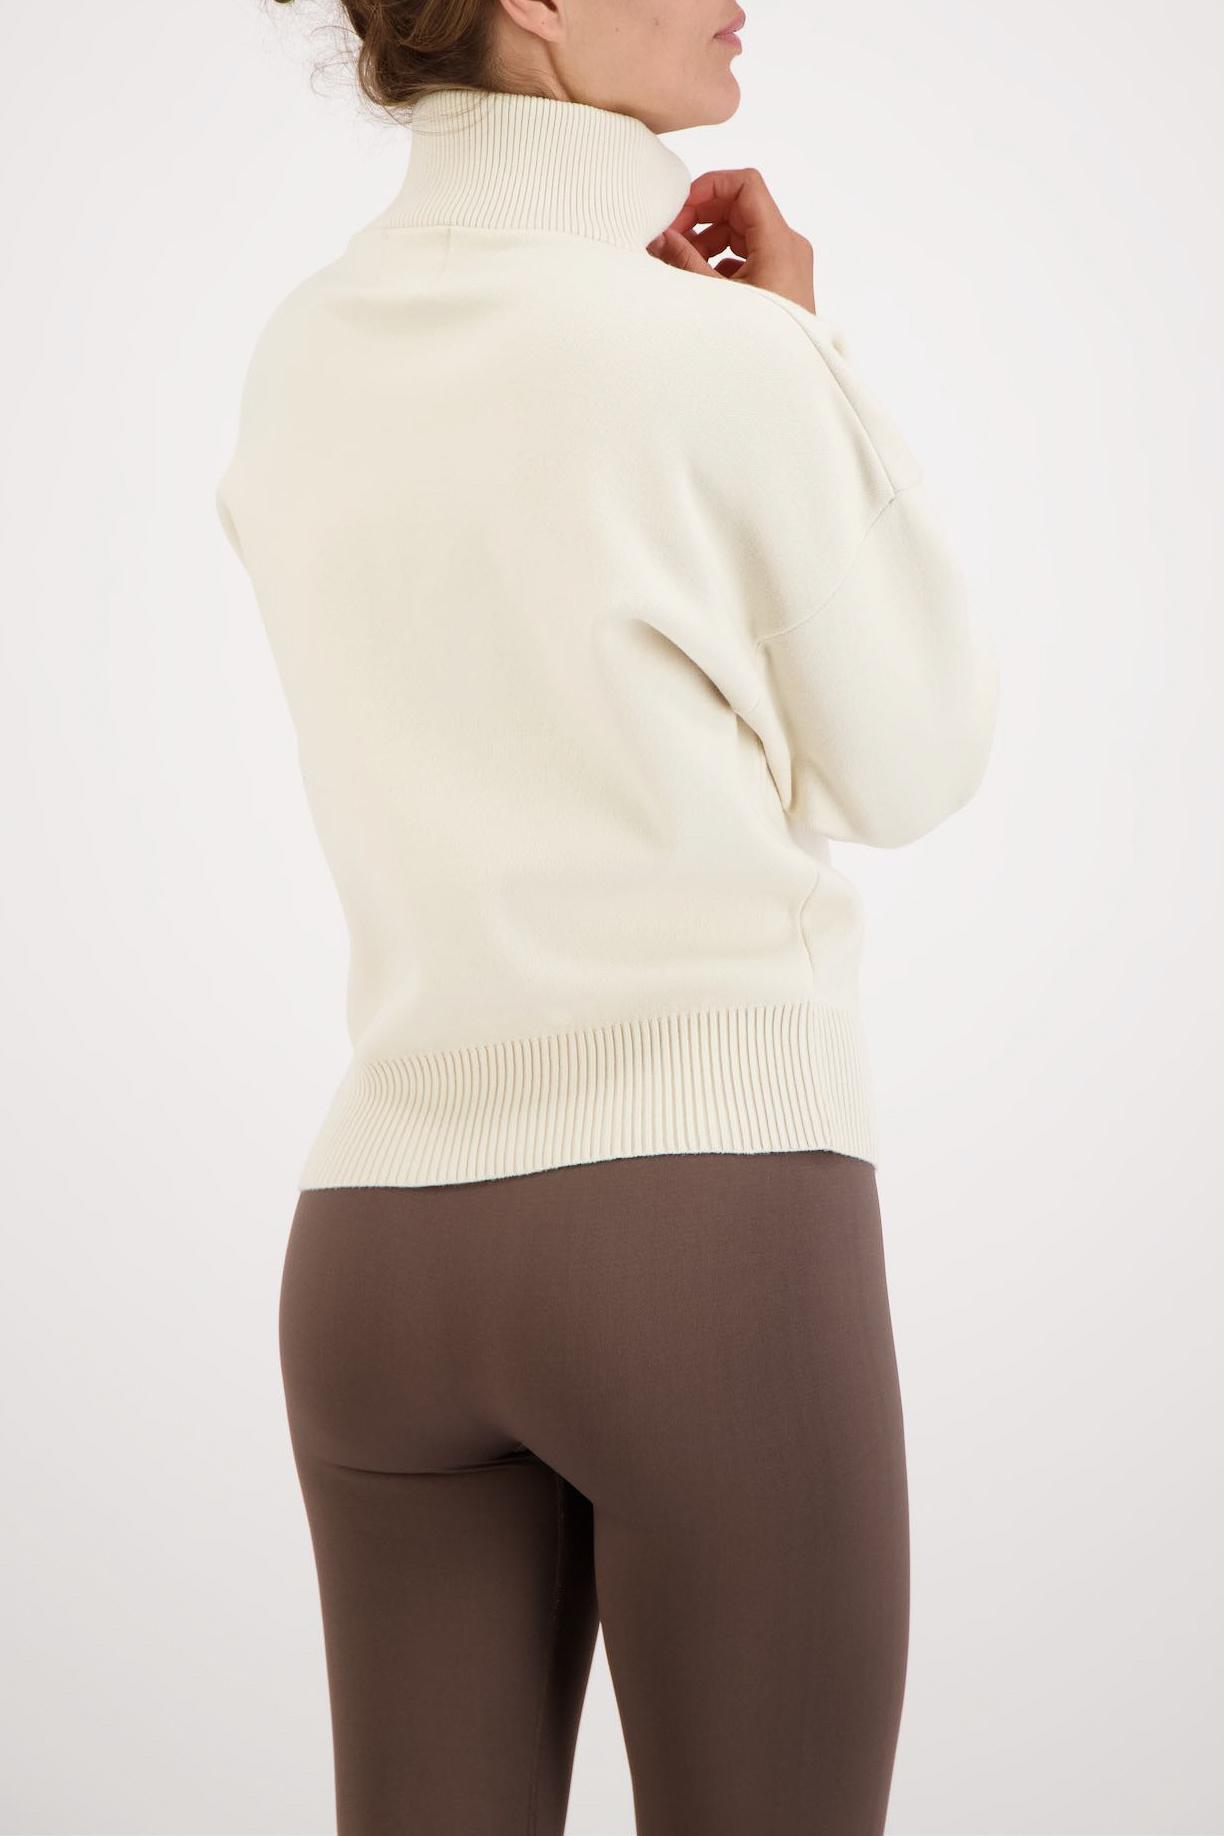 Olly Half-Zip Knit Sweater - Cream White-3